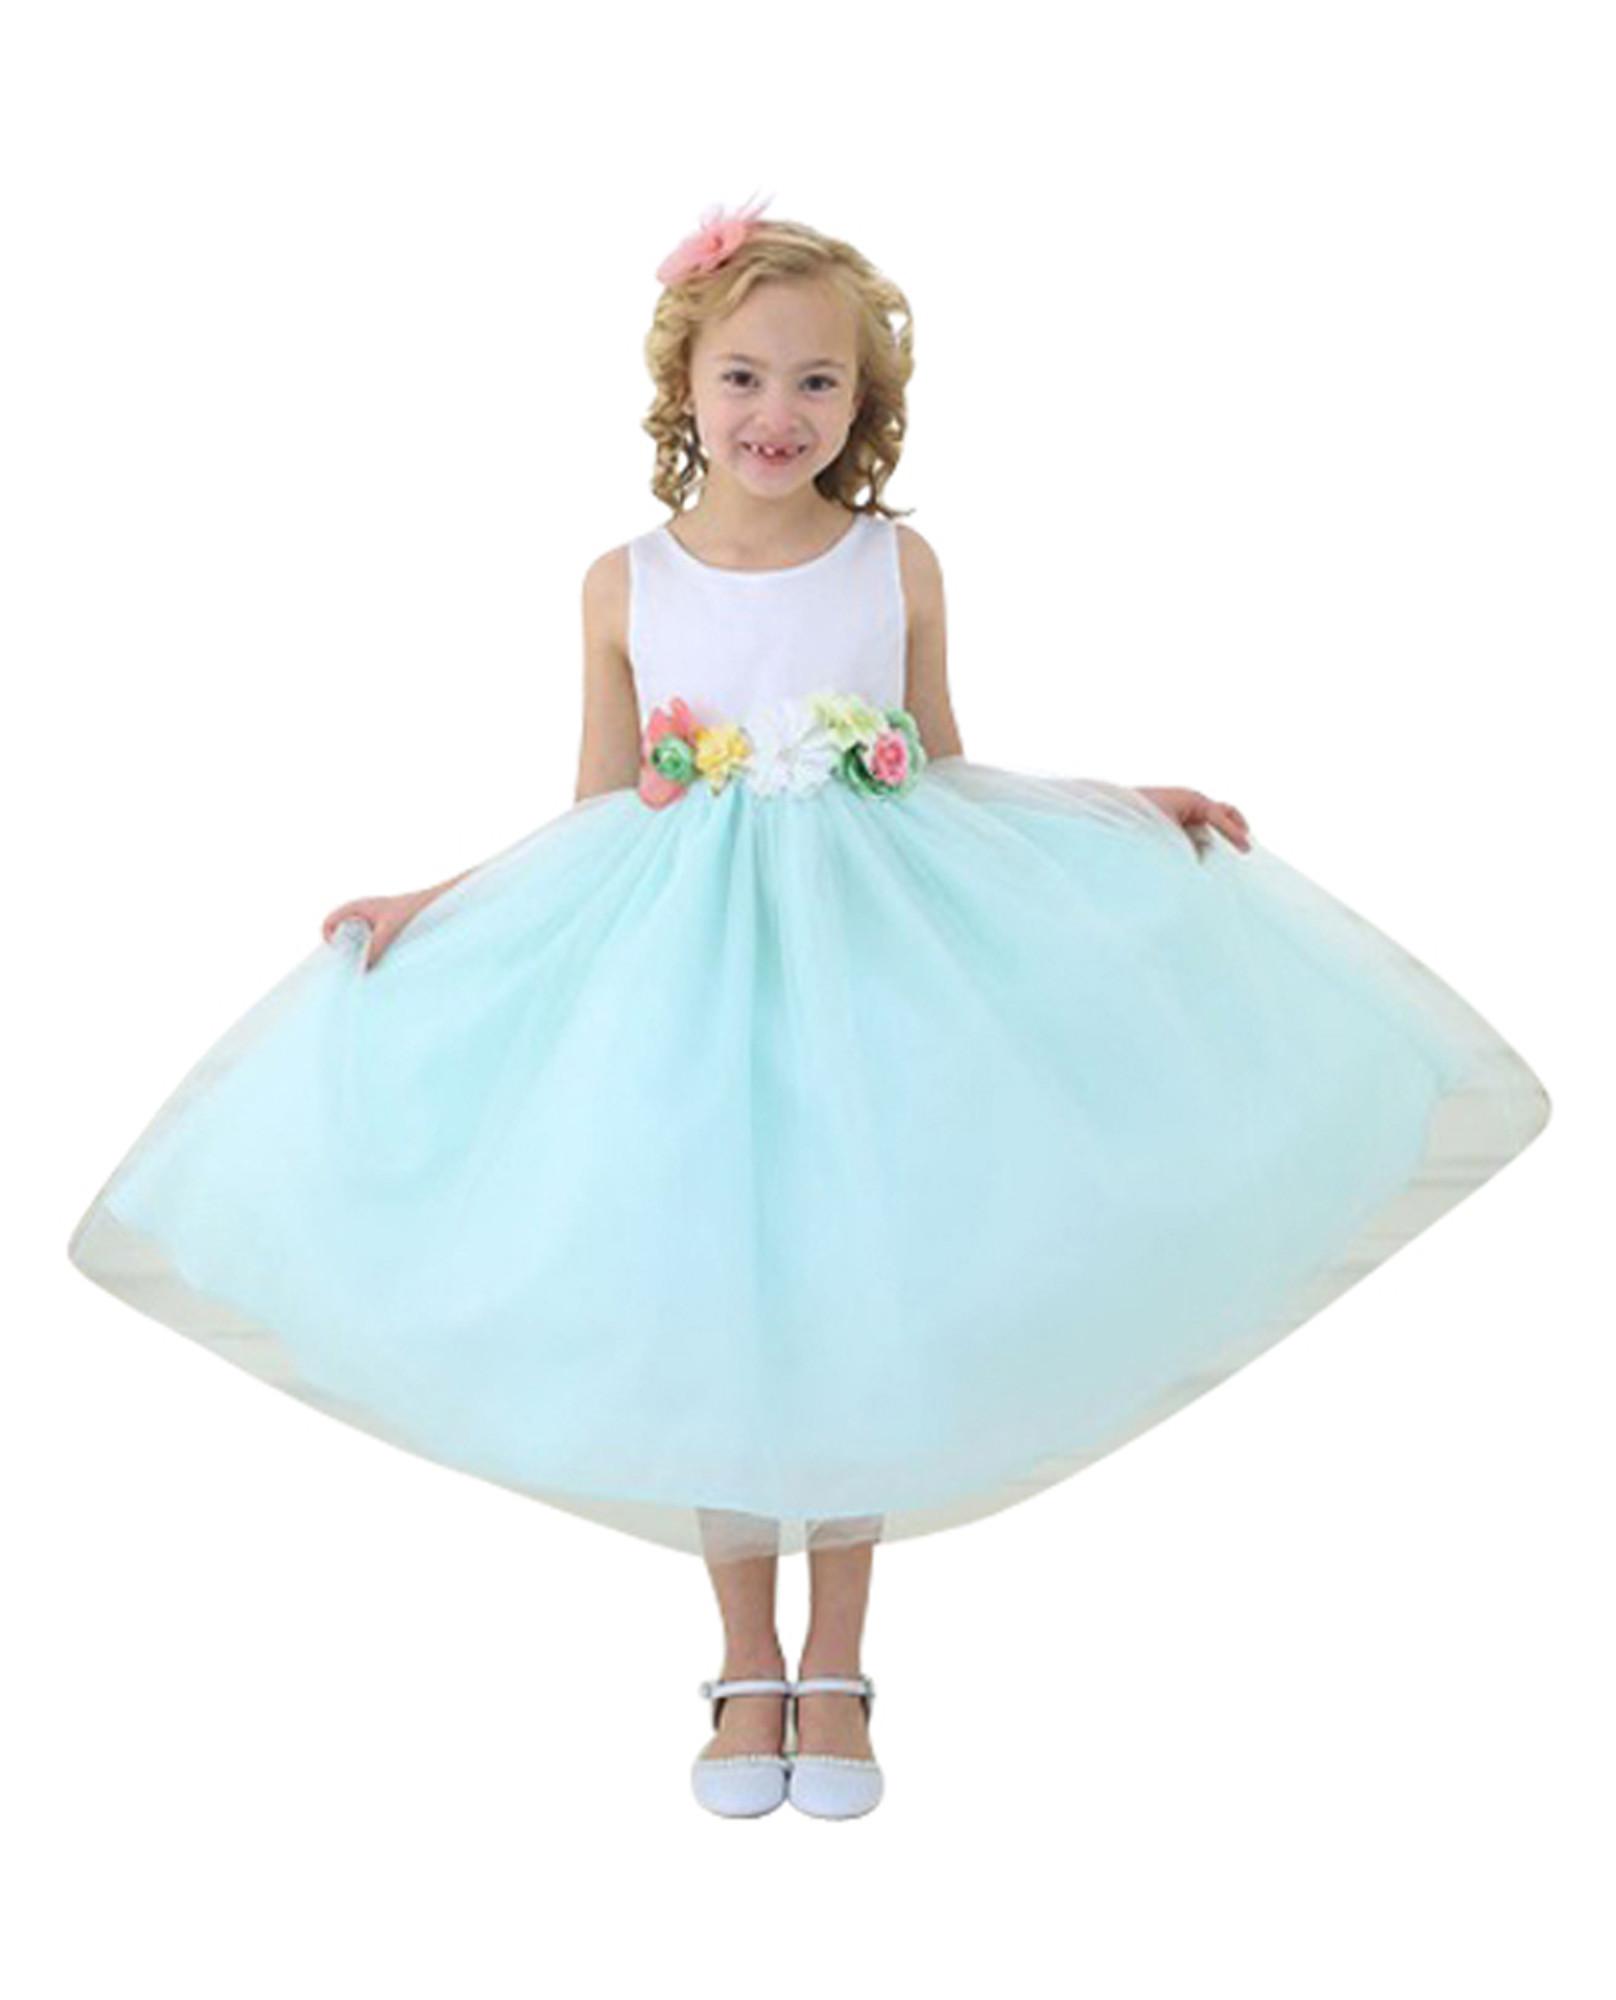 BIMARO Mädchen Kleid Tamia mintgrün grün weiß Blüten Satin Tüll ...